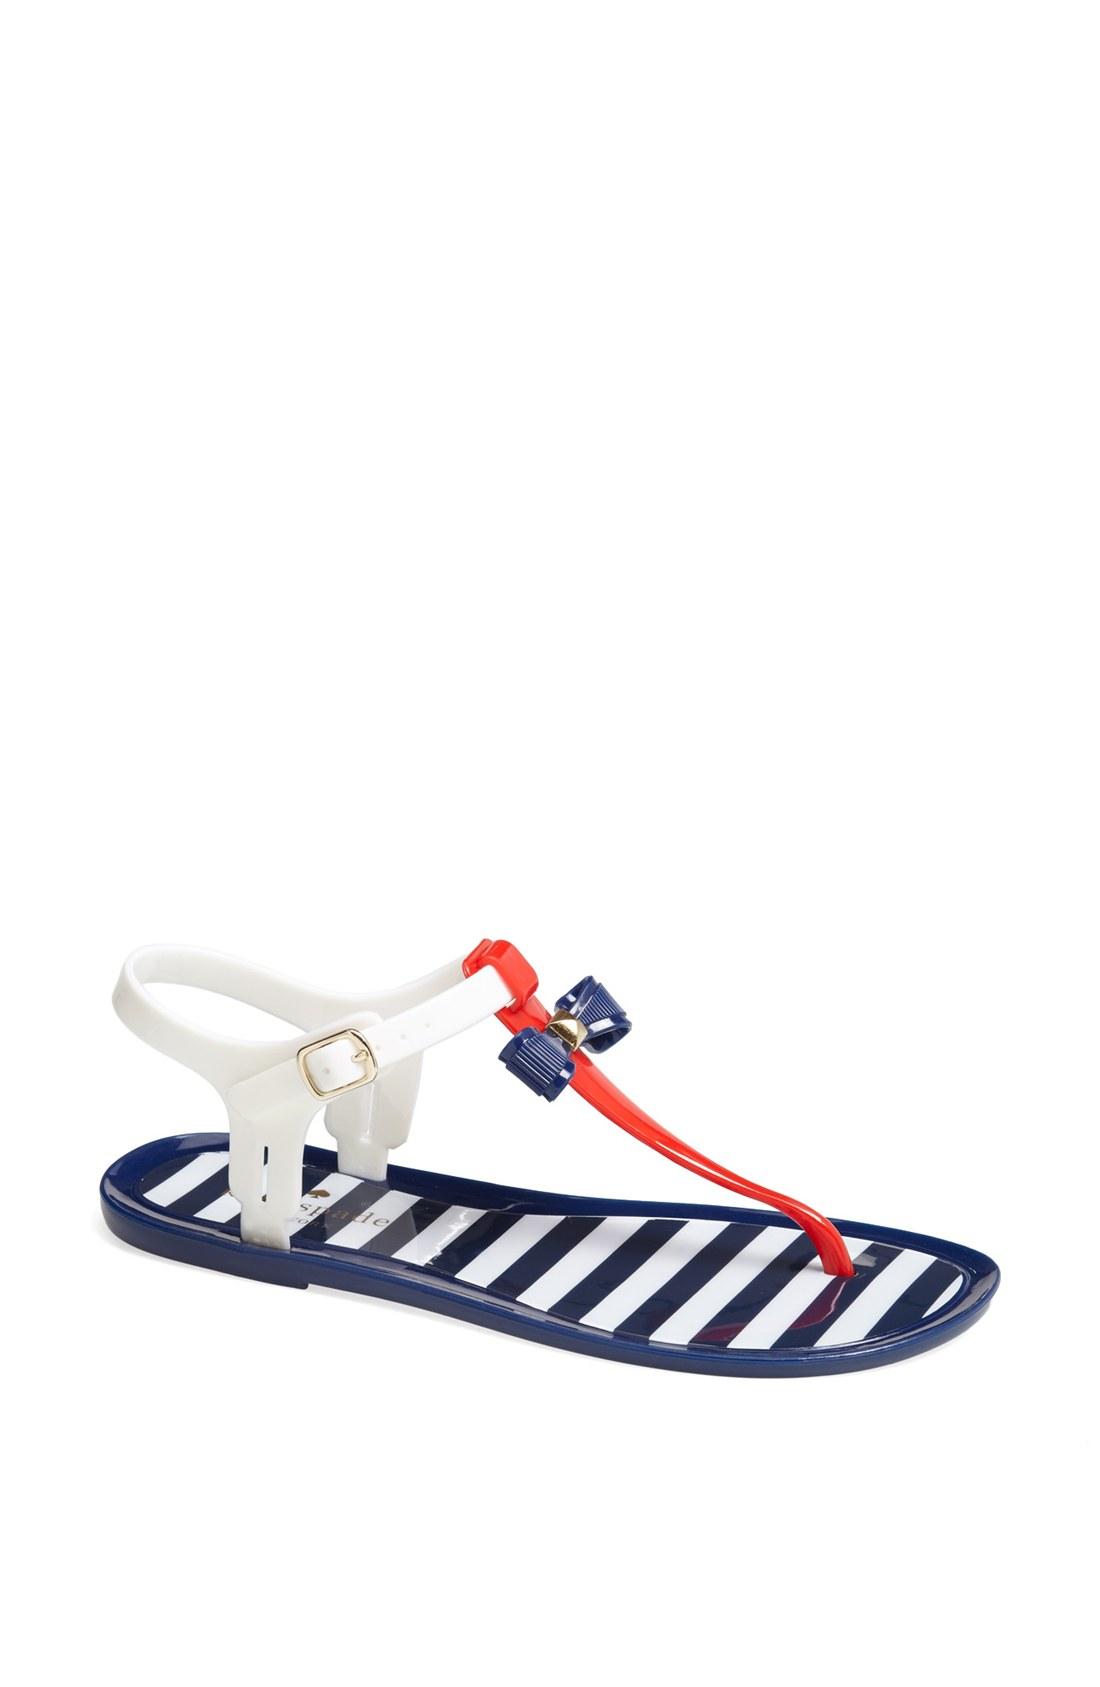 Kate Spade Fresh Jelly Sandal In Blue Red White Navy